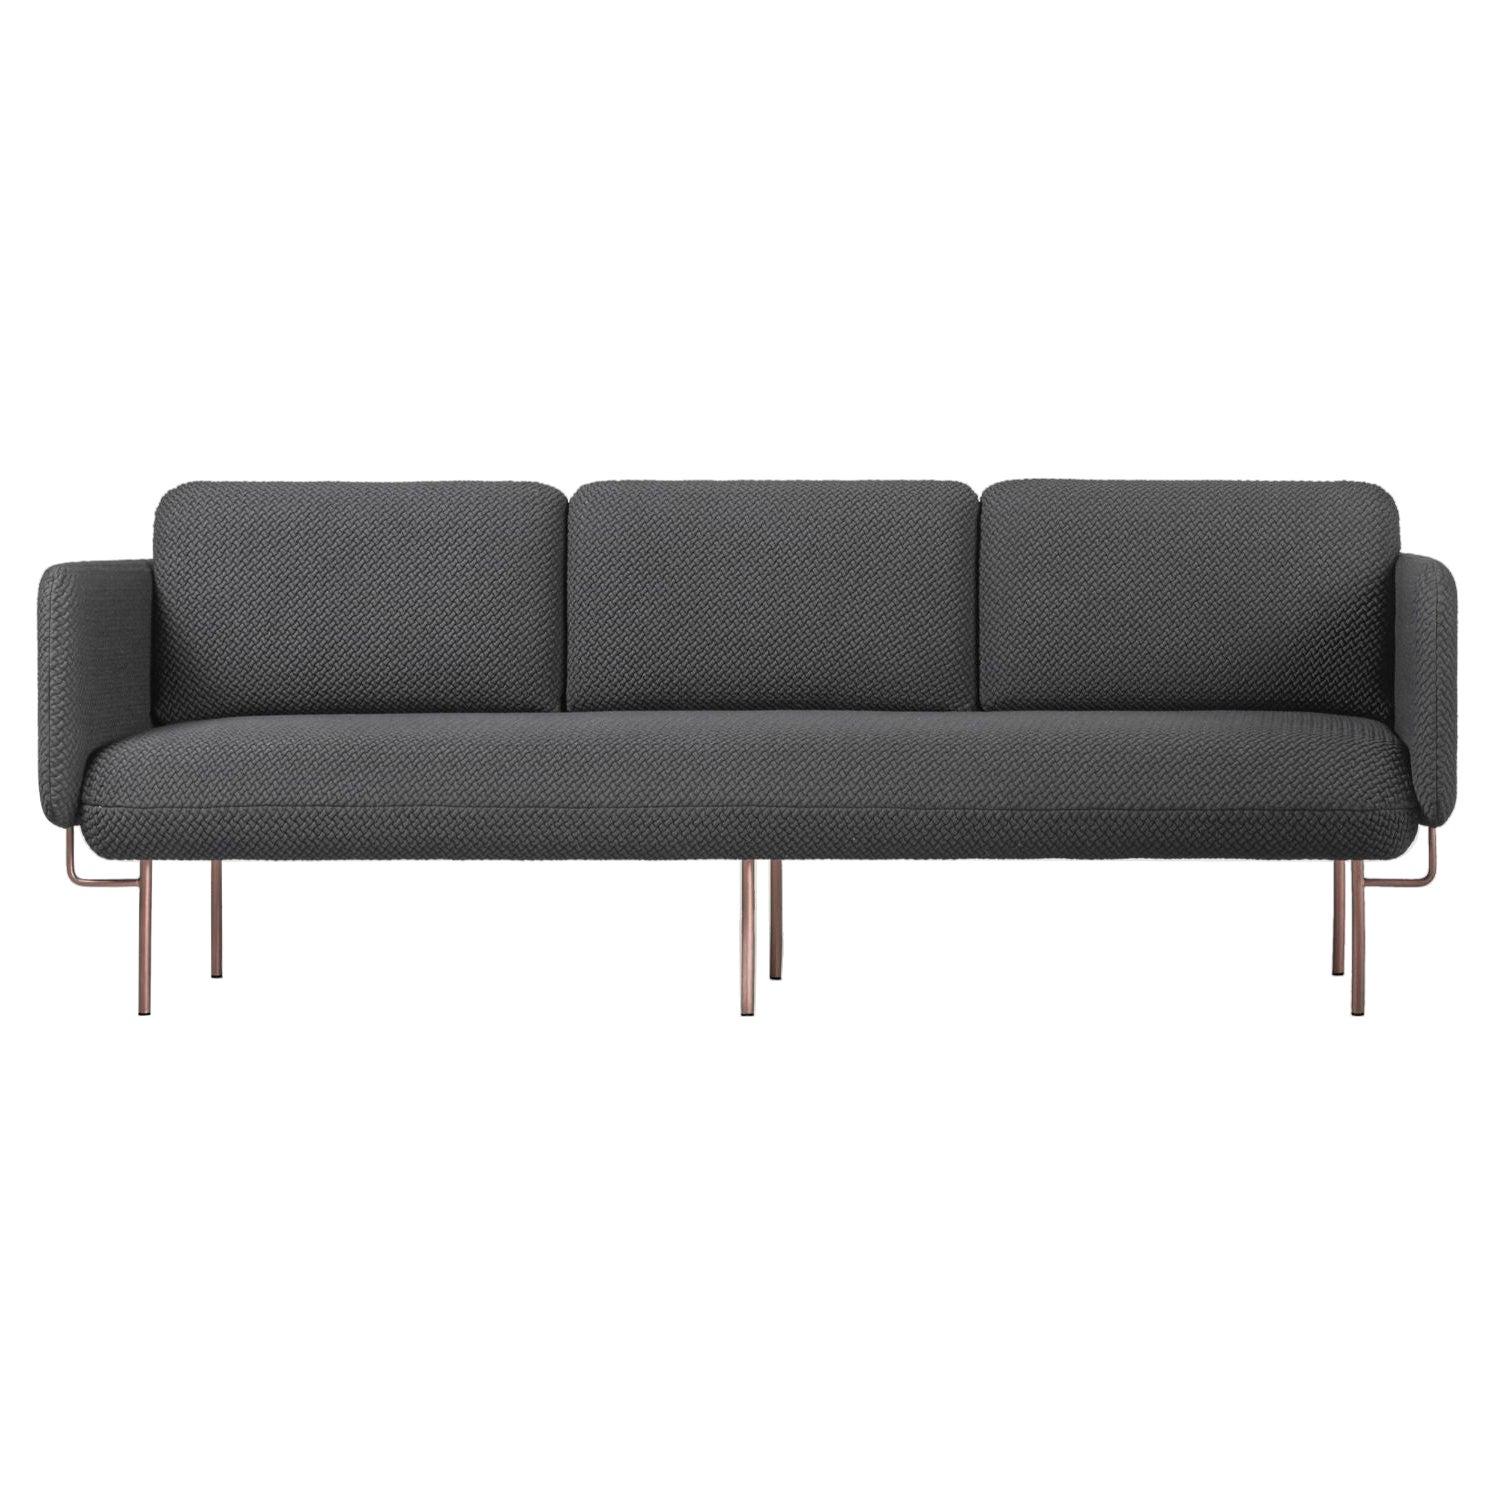 Gray Alce Sofa, Maxi by Chris Hardy